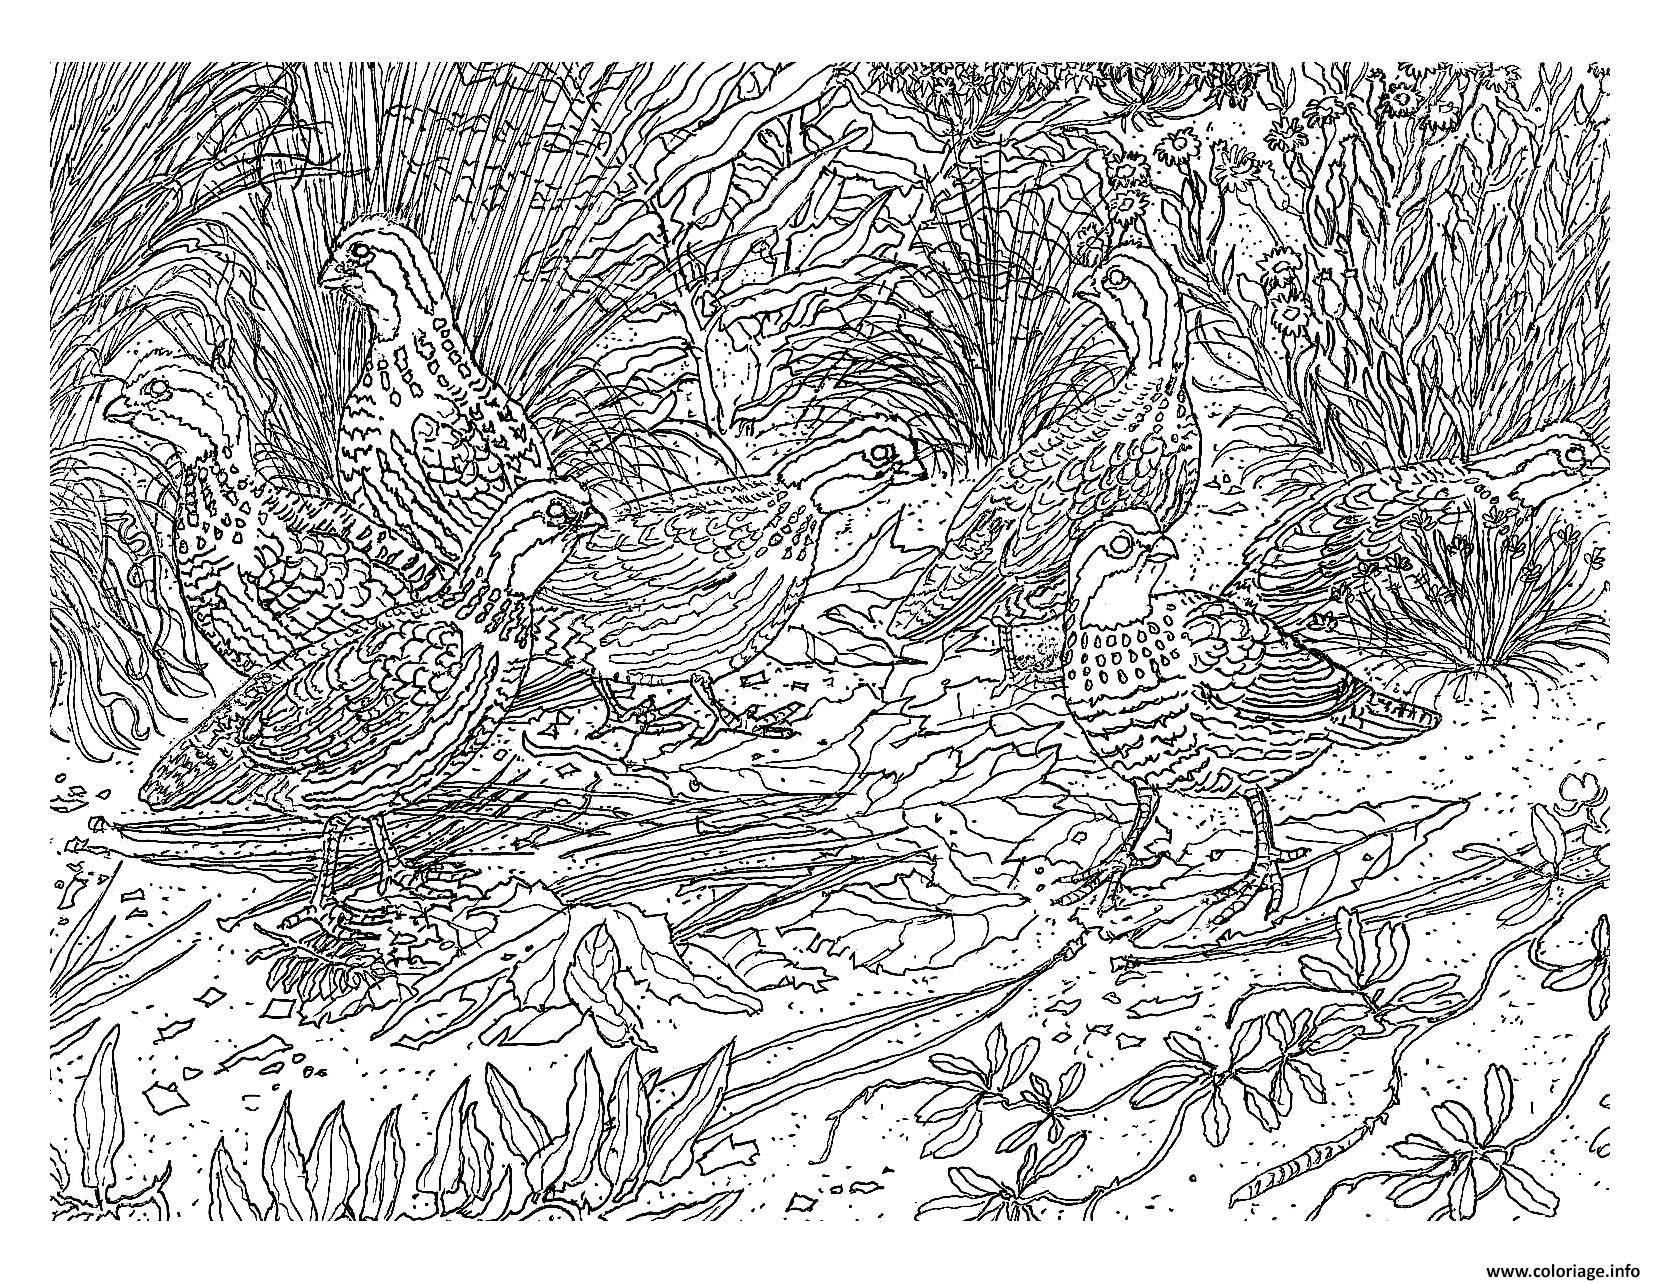 Coloriage Difficile Oiseau Dessin  Imprimer